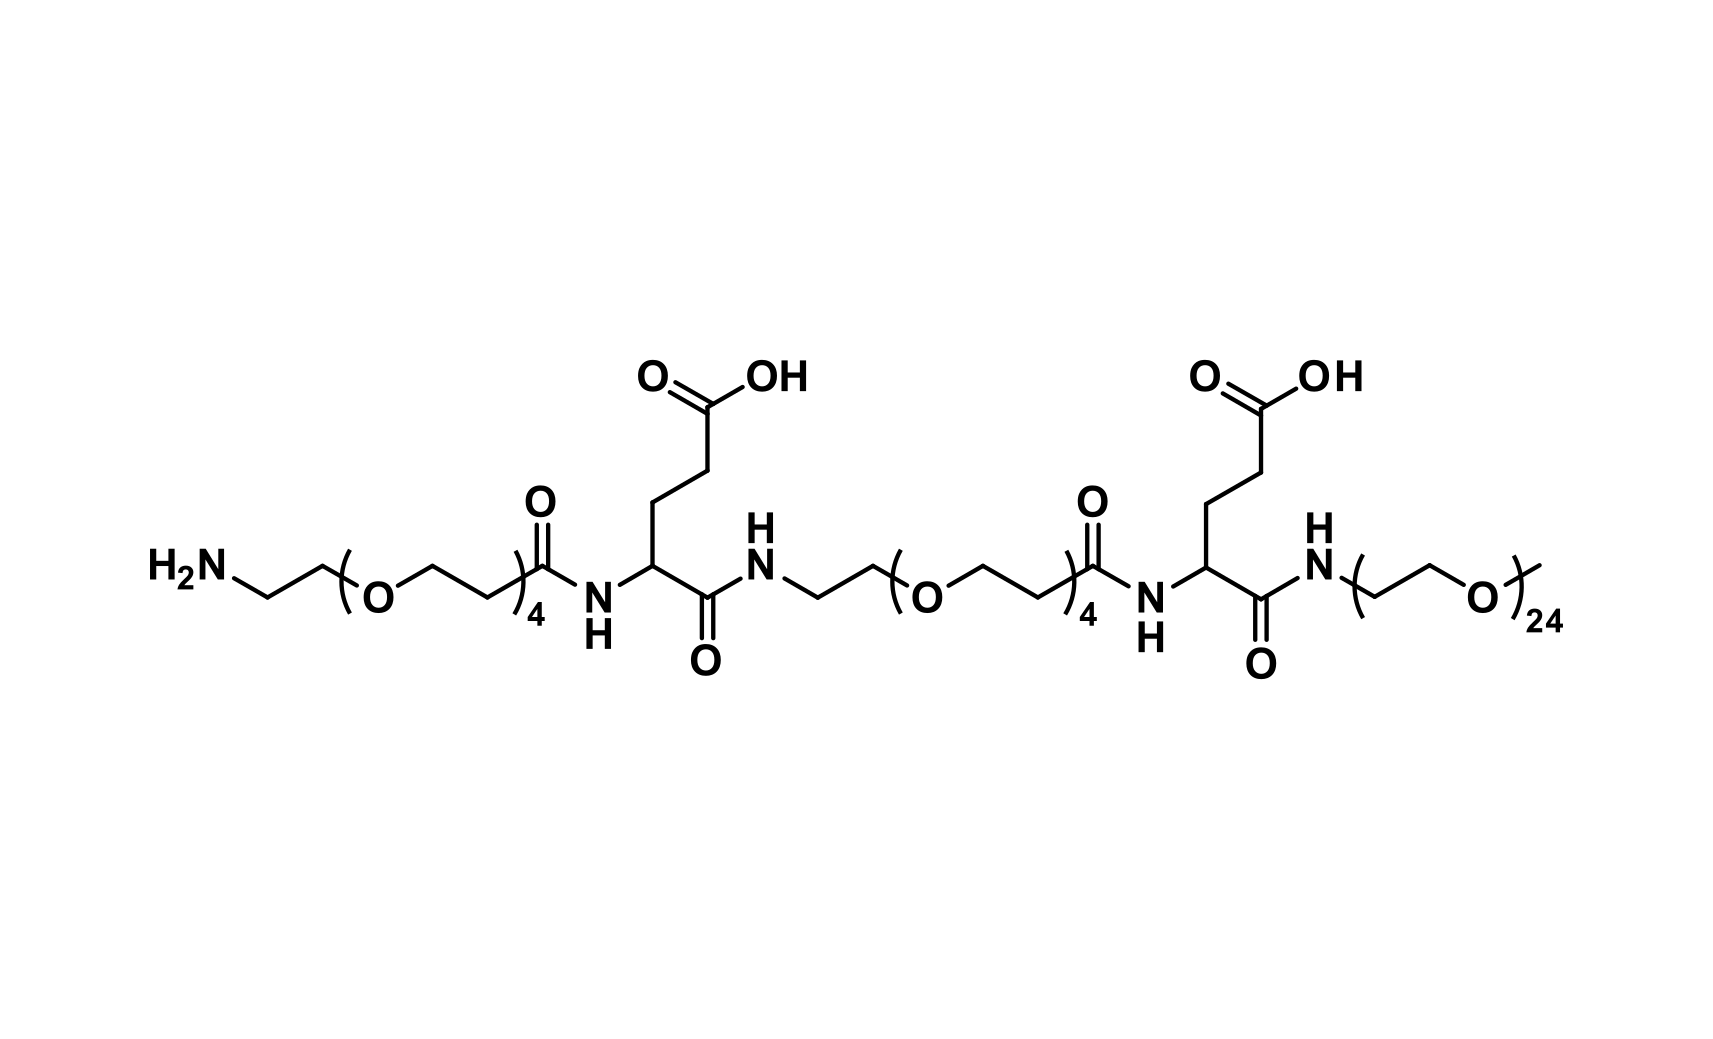 NH₂-dPEG®₄-Glu(OH)-NH-dPEG®₄-Glu(OH)-NH-m-dPEG®₂₄